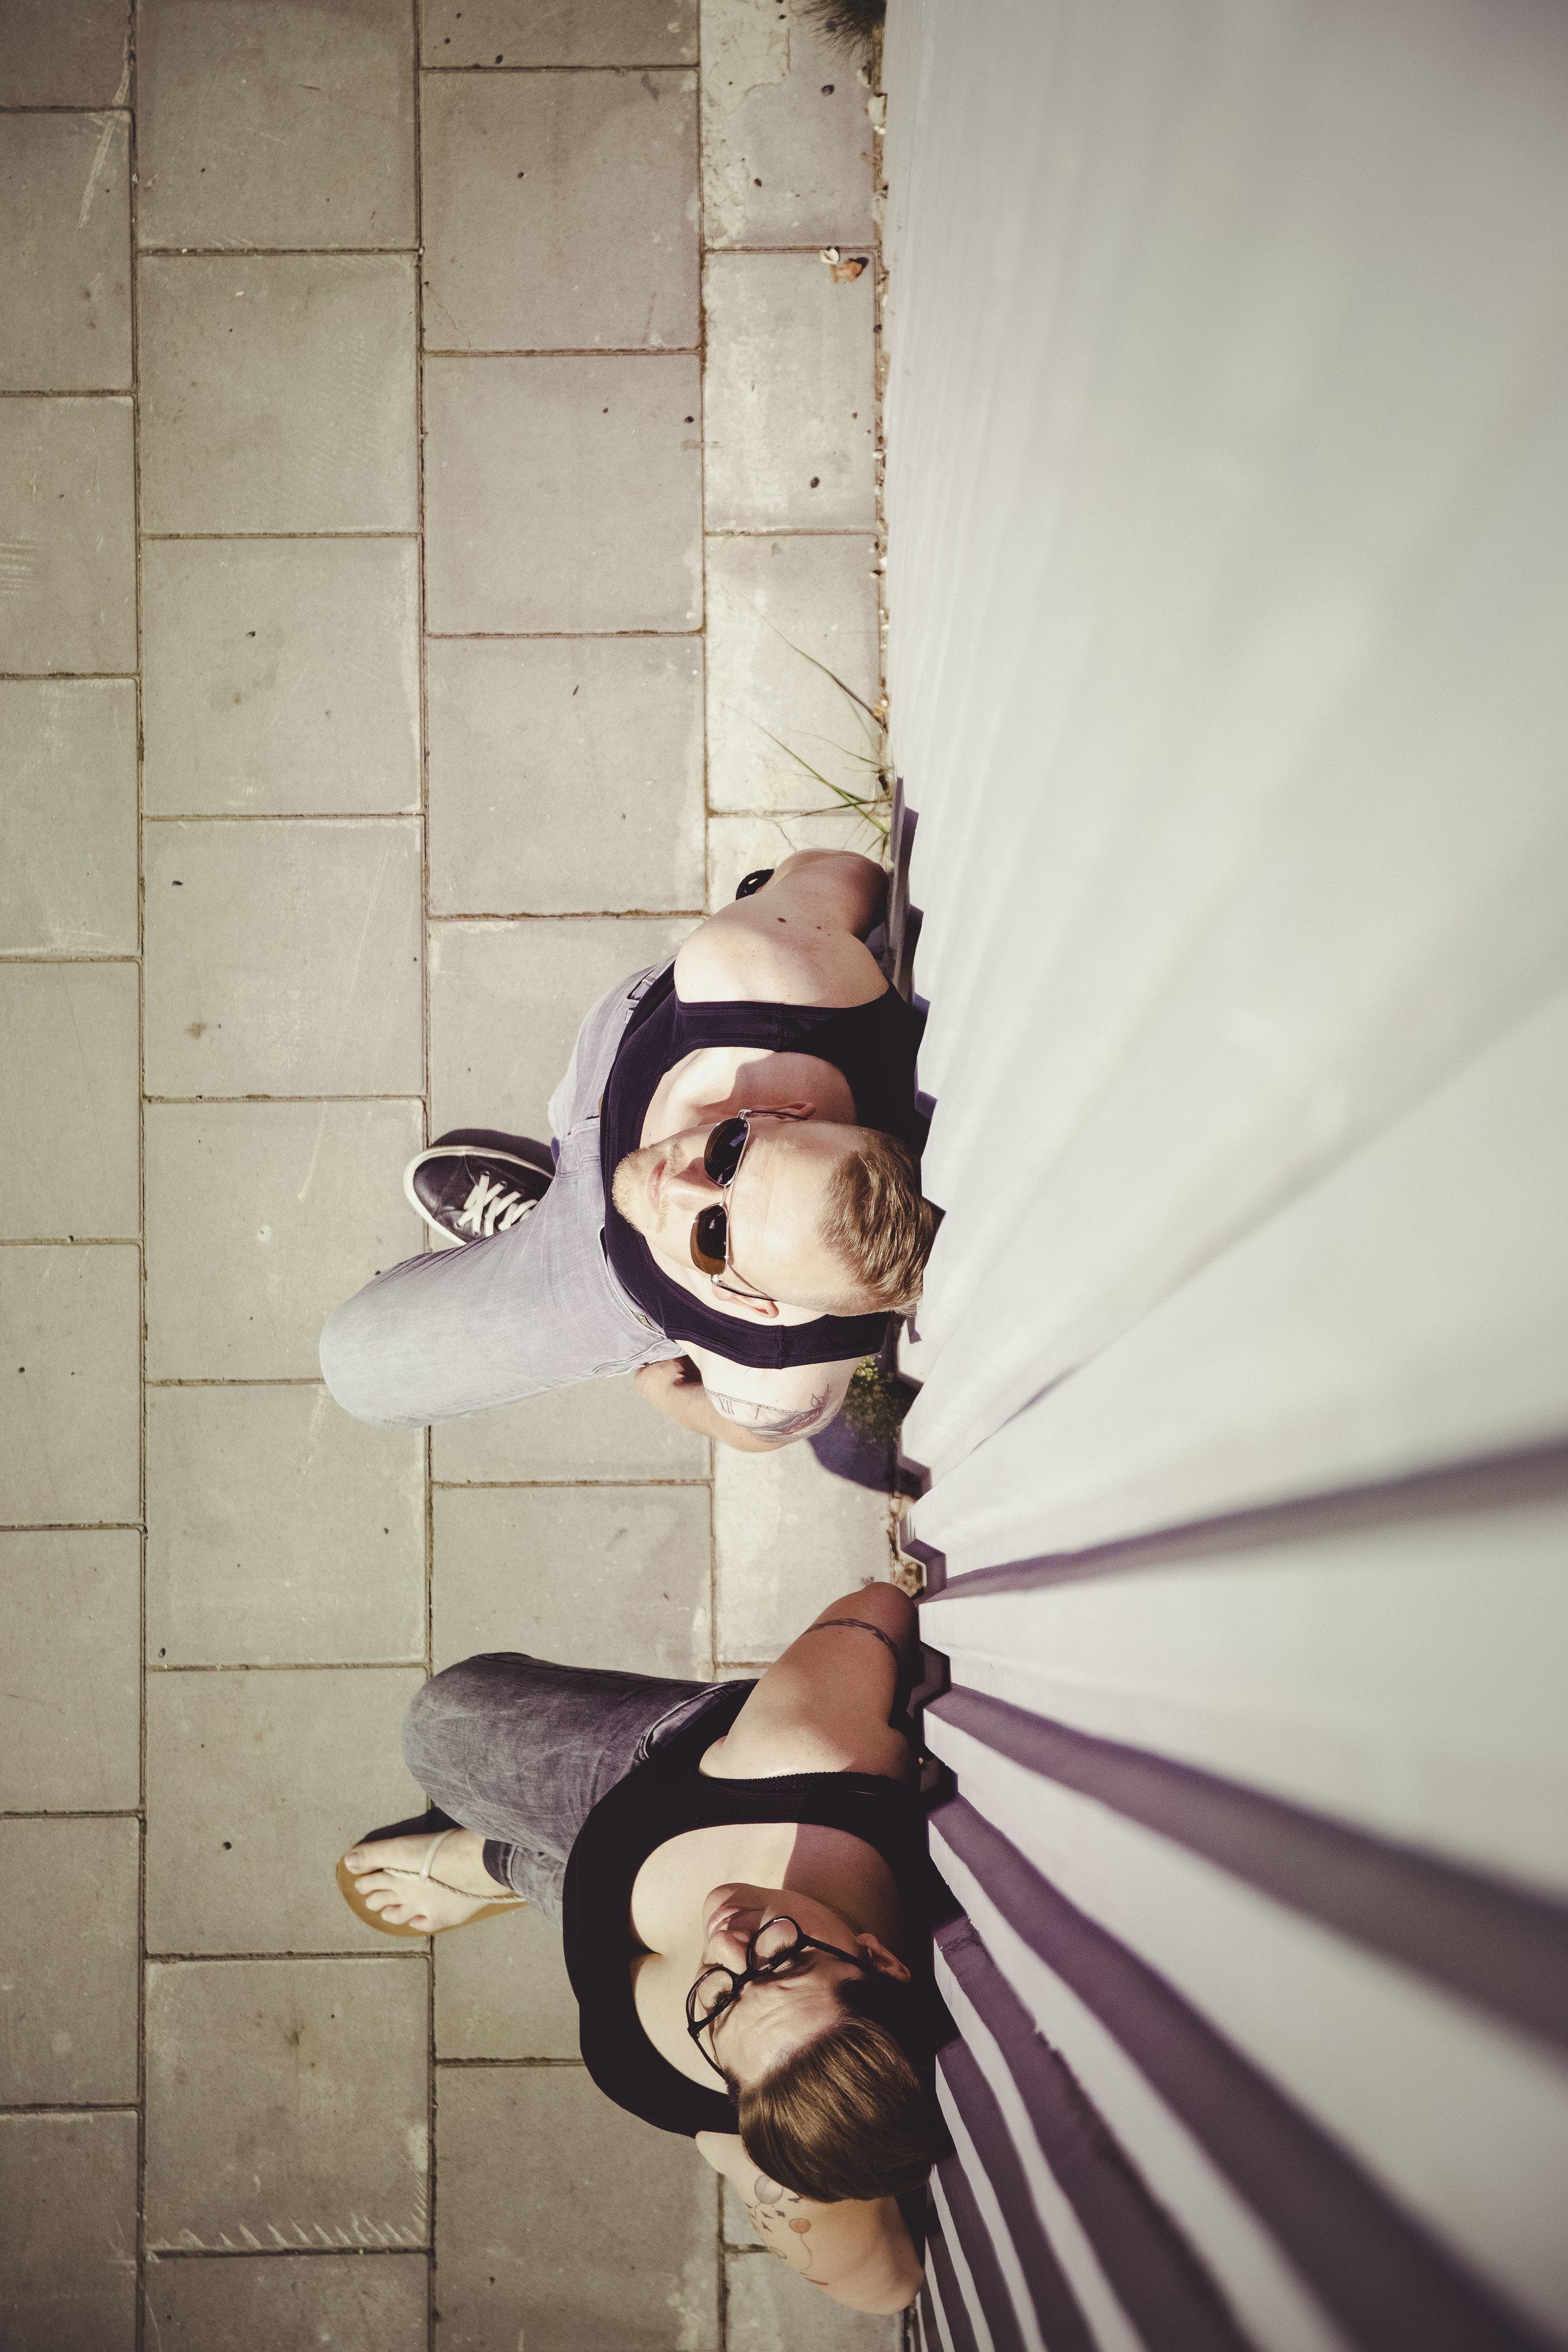 viewfinder-fotoshoot-gert-angelique-winnaars-2.jpg